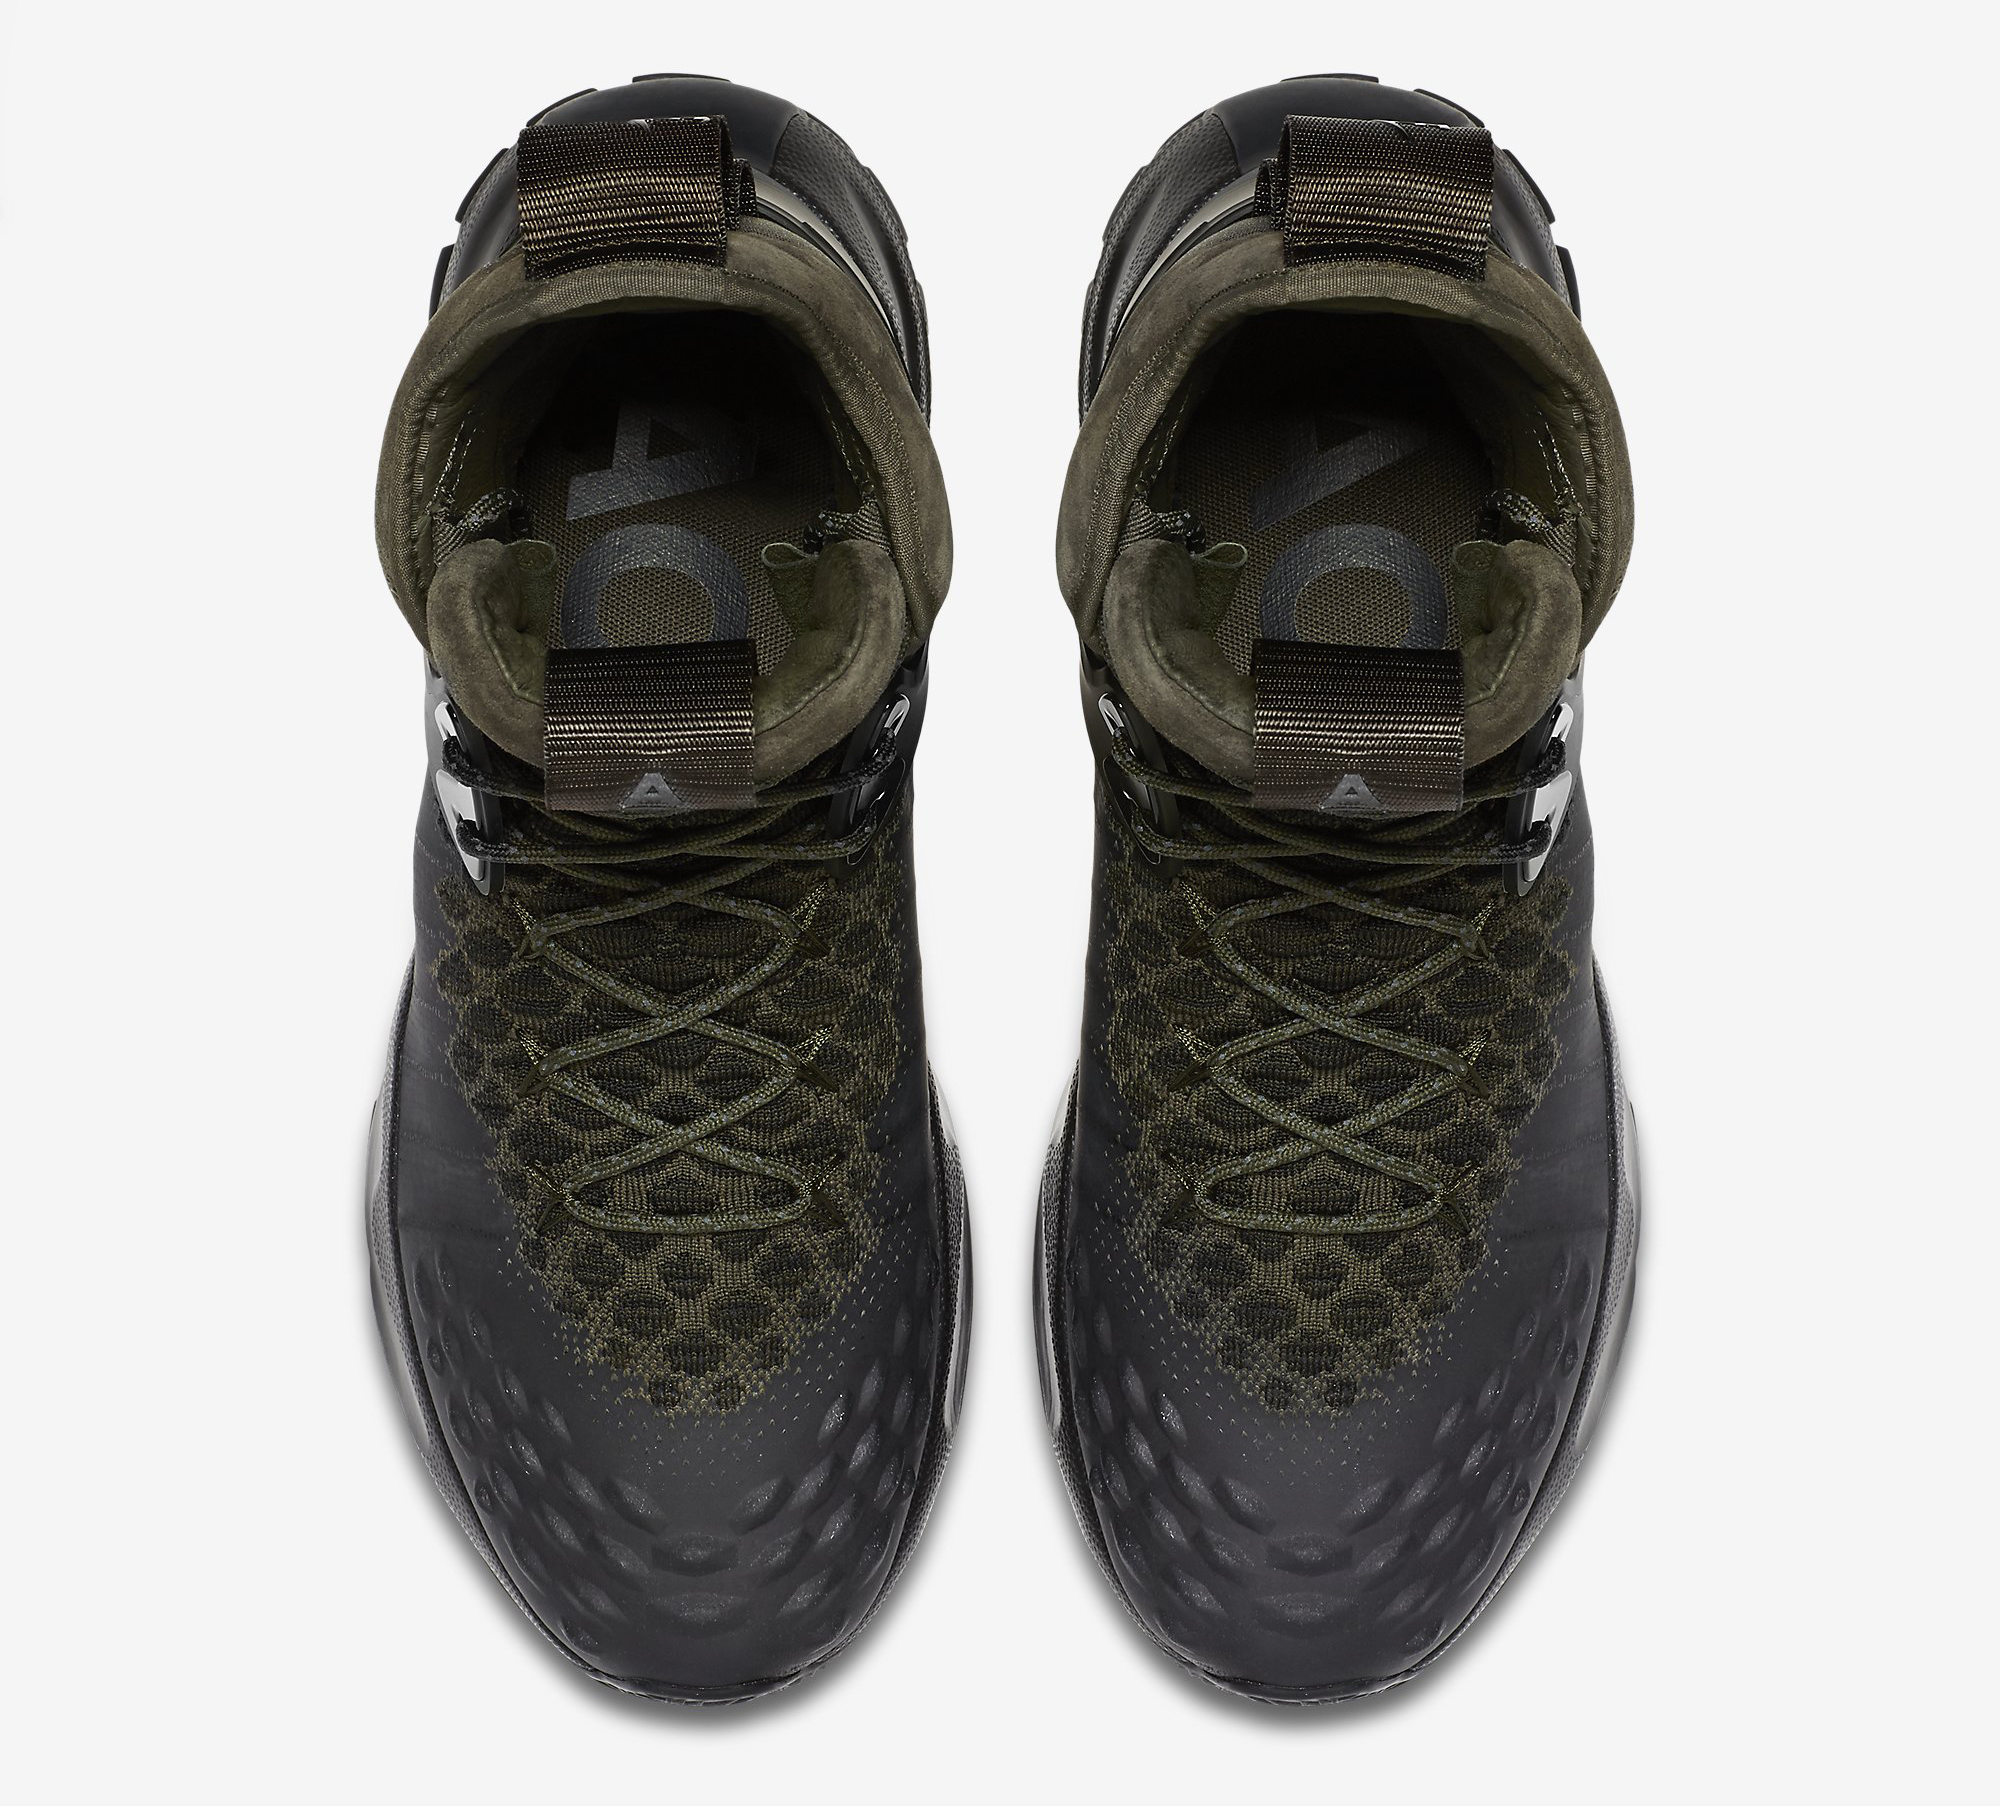 1abd47f8c4a16 NikeLab Air Zoom Tallac Flyknit 865947-002 Olive Top